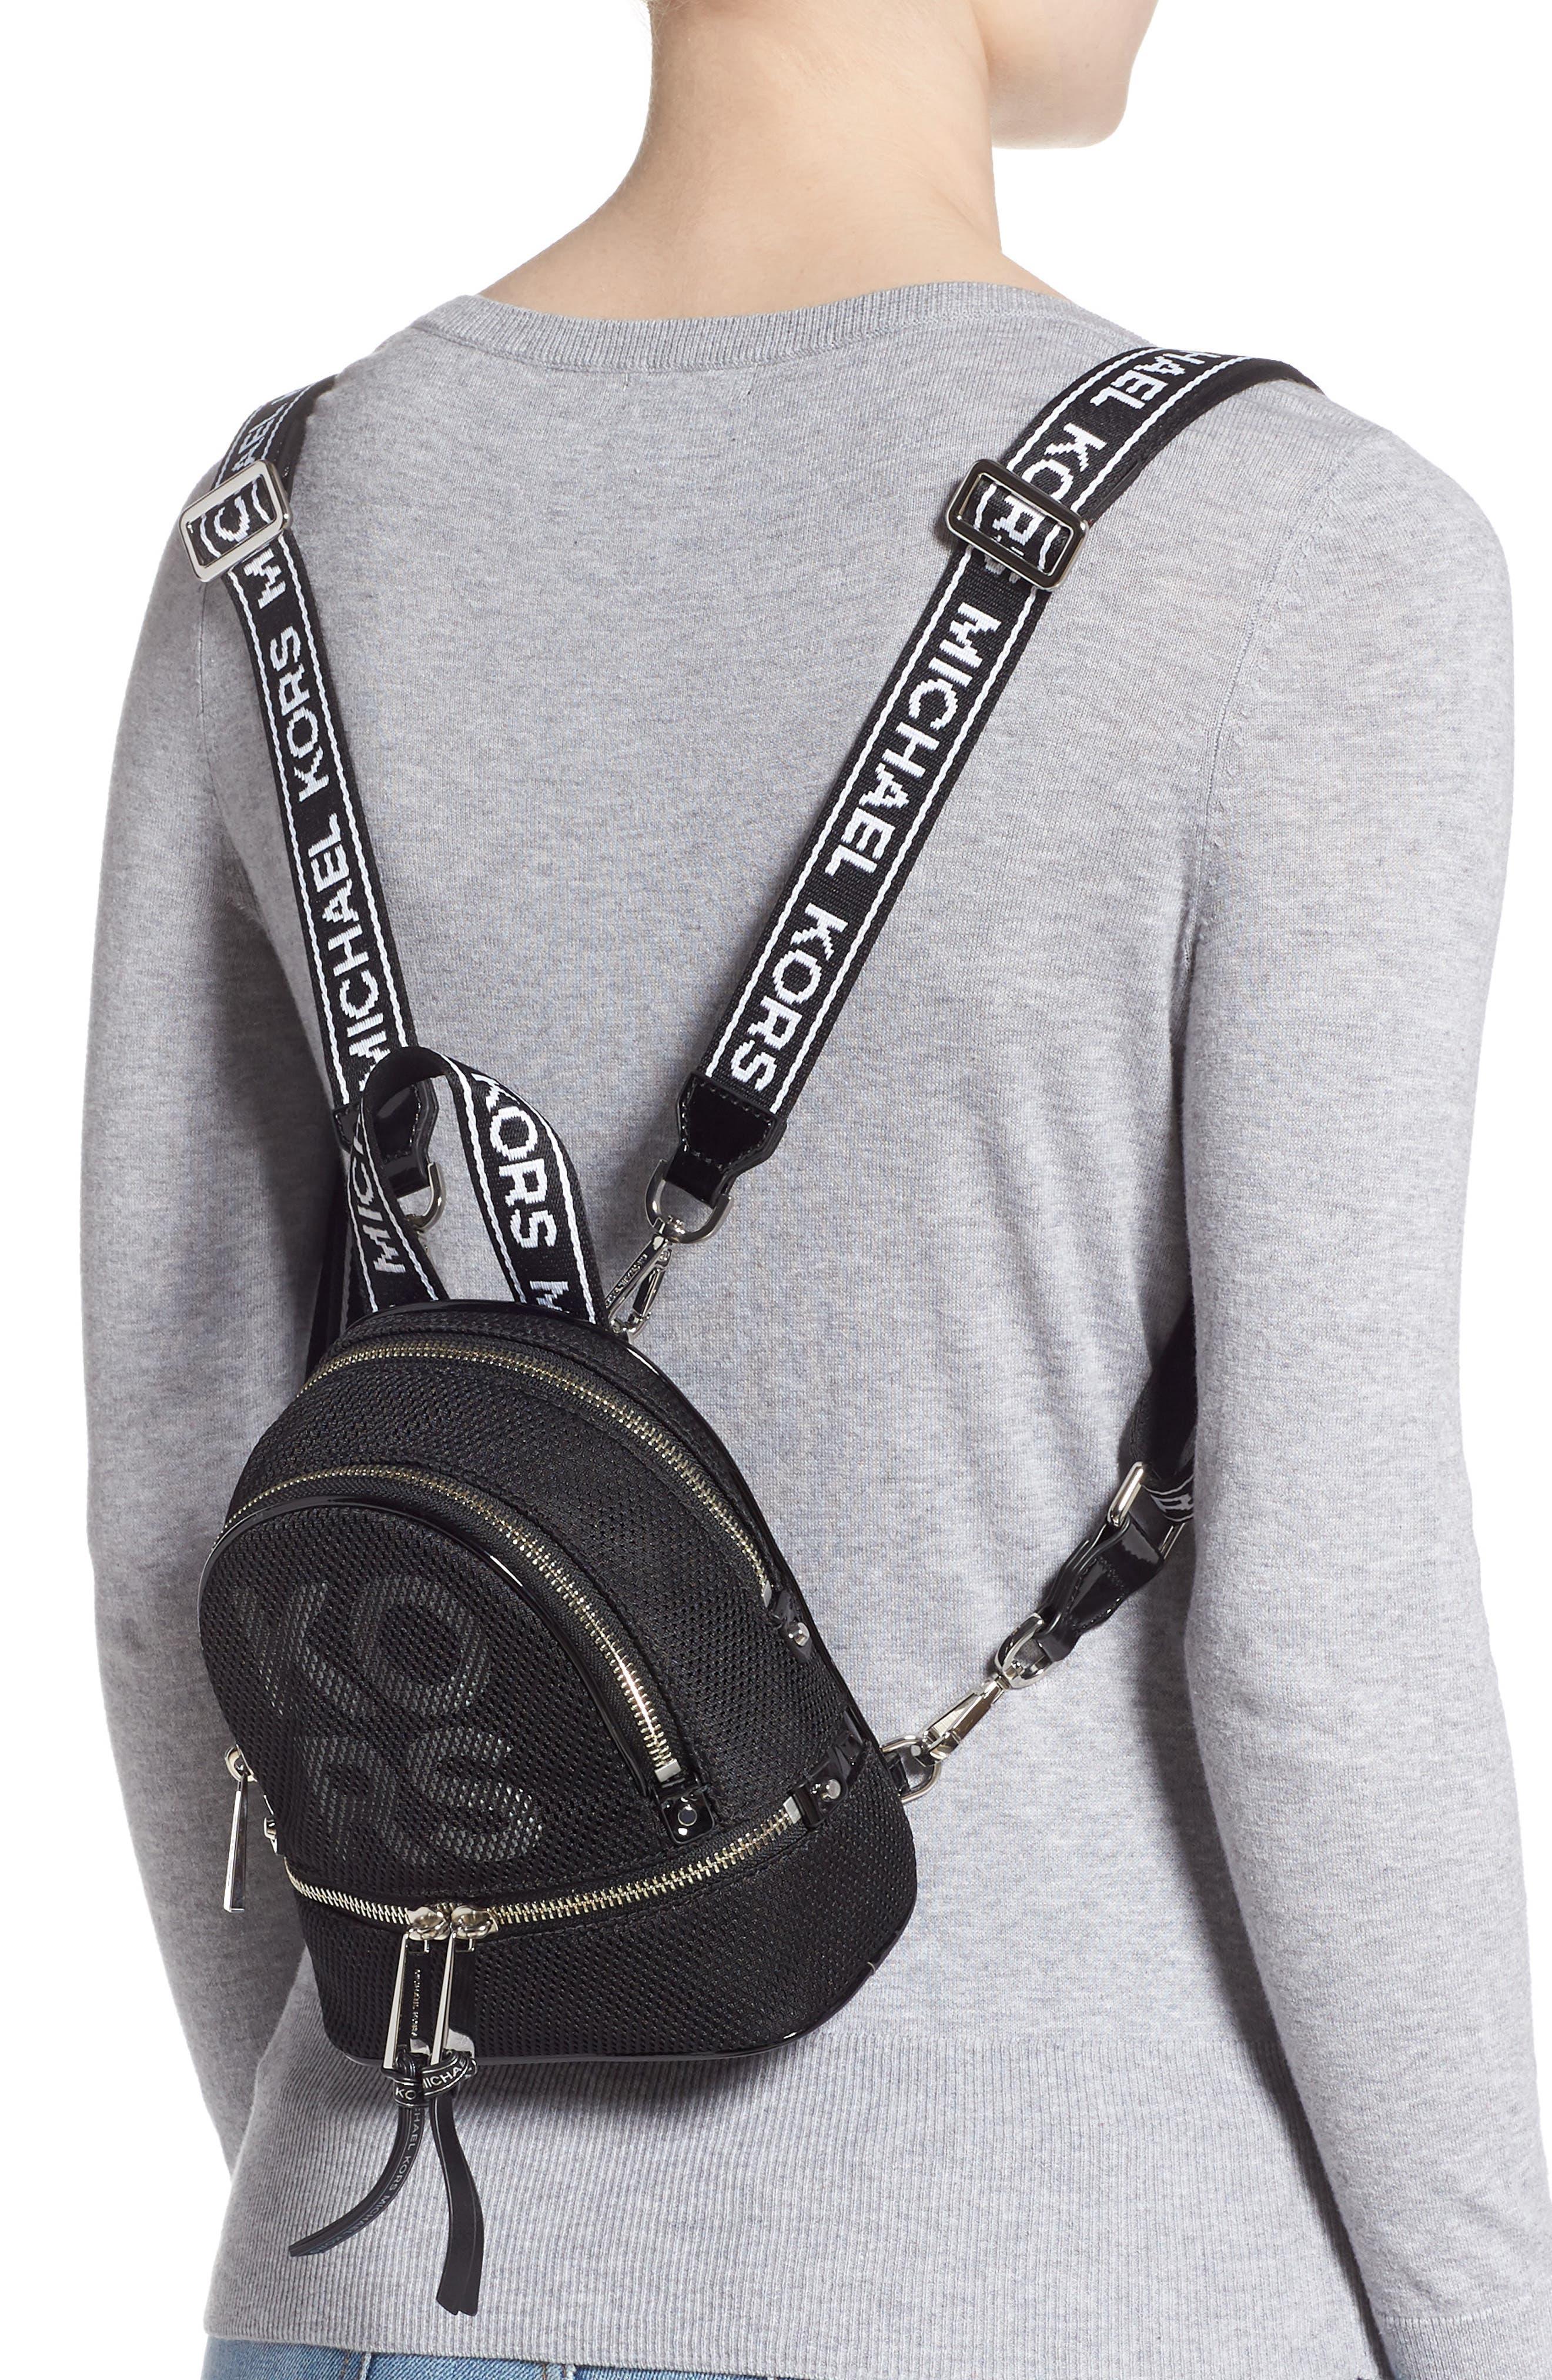 MICHAEL MICHAEL KORS, Extra Small Rhea Mesh Backpack, Alternate thumbnail 2, color, BLACK/ OPTIC WHITE